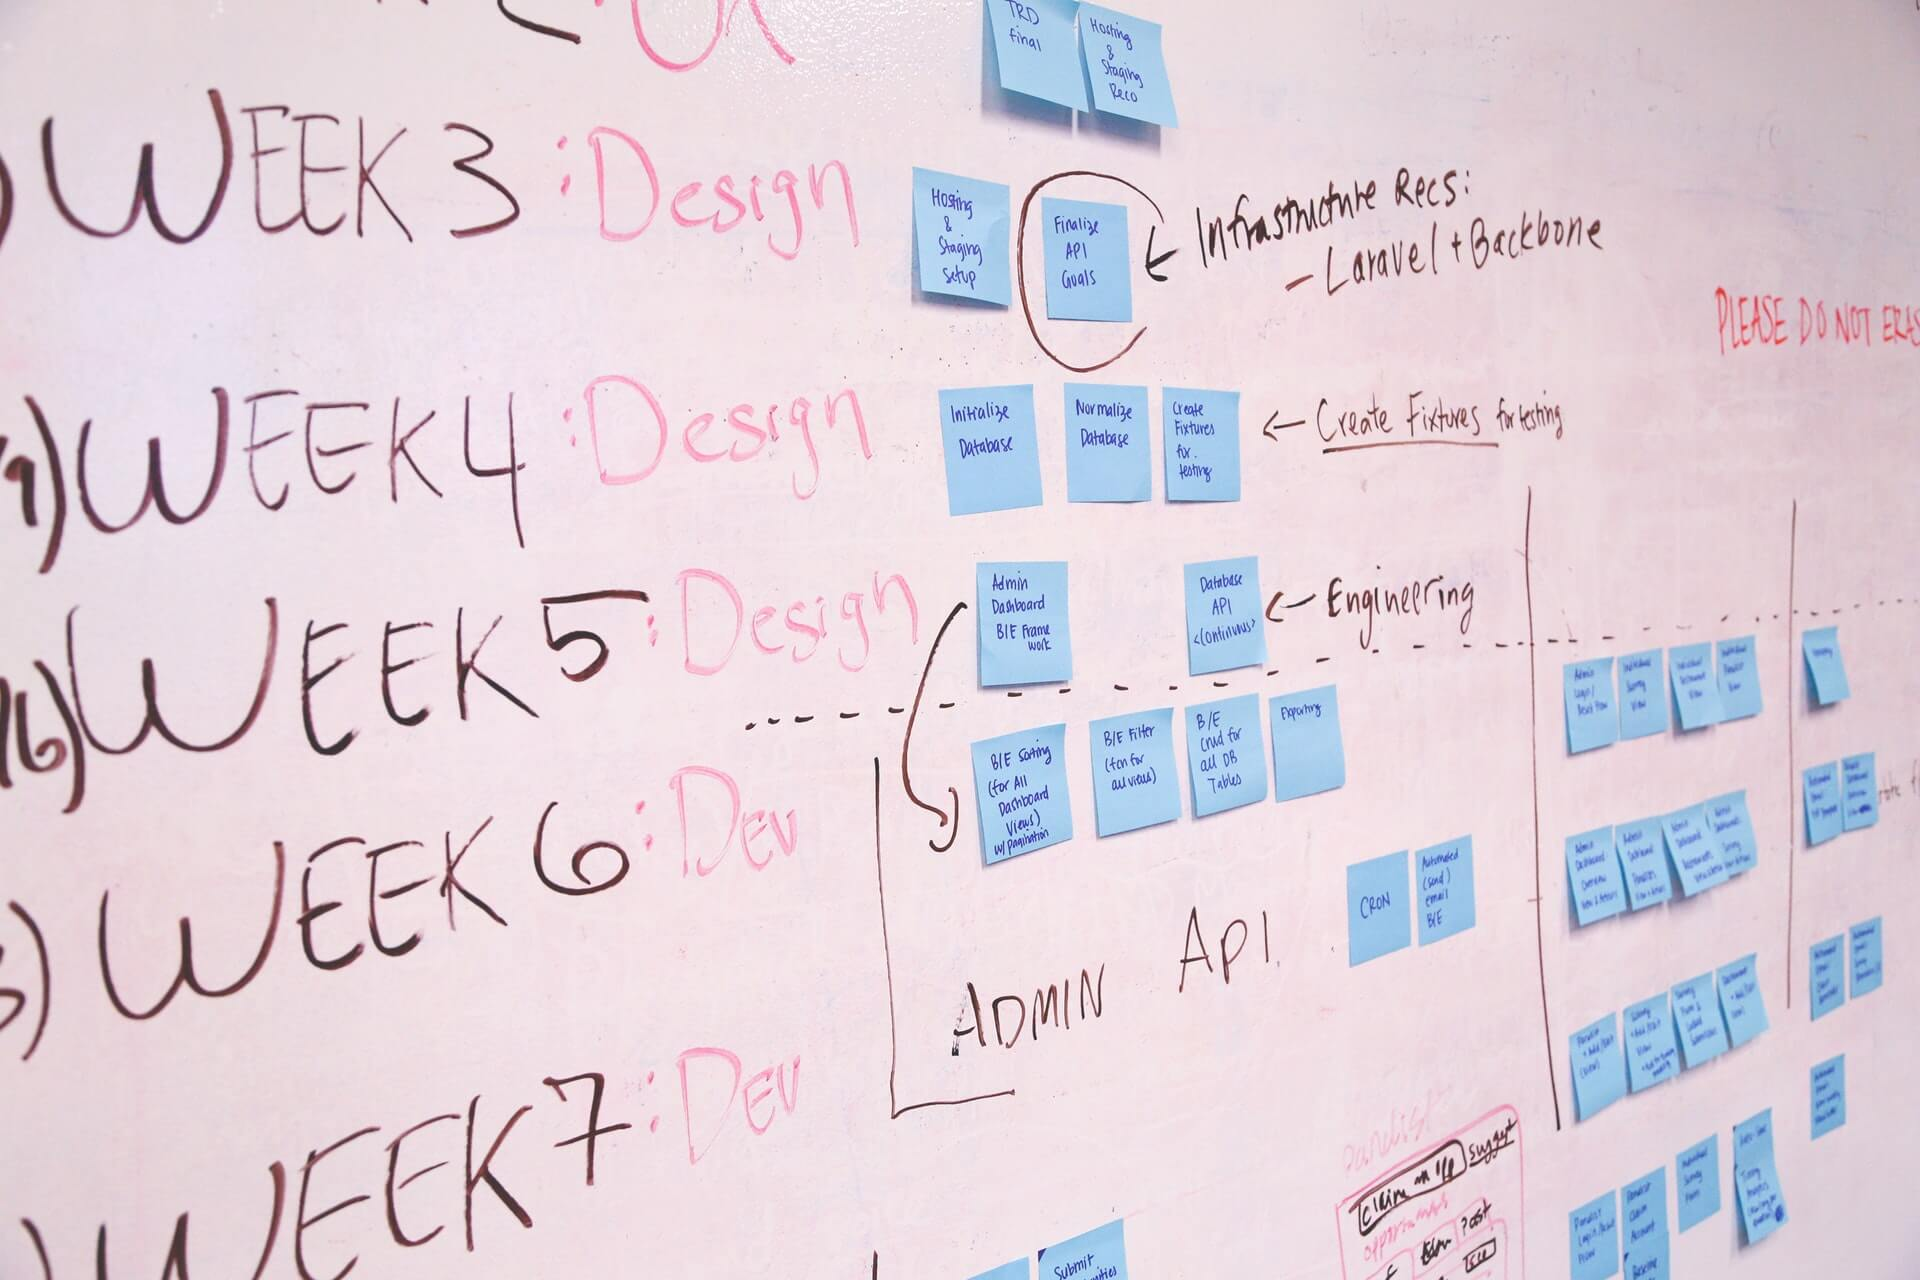 Lean startup, agile & design thinking